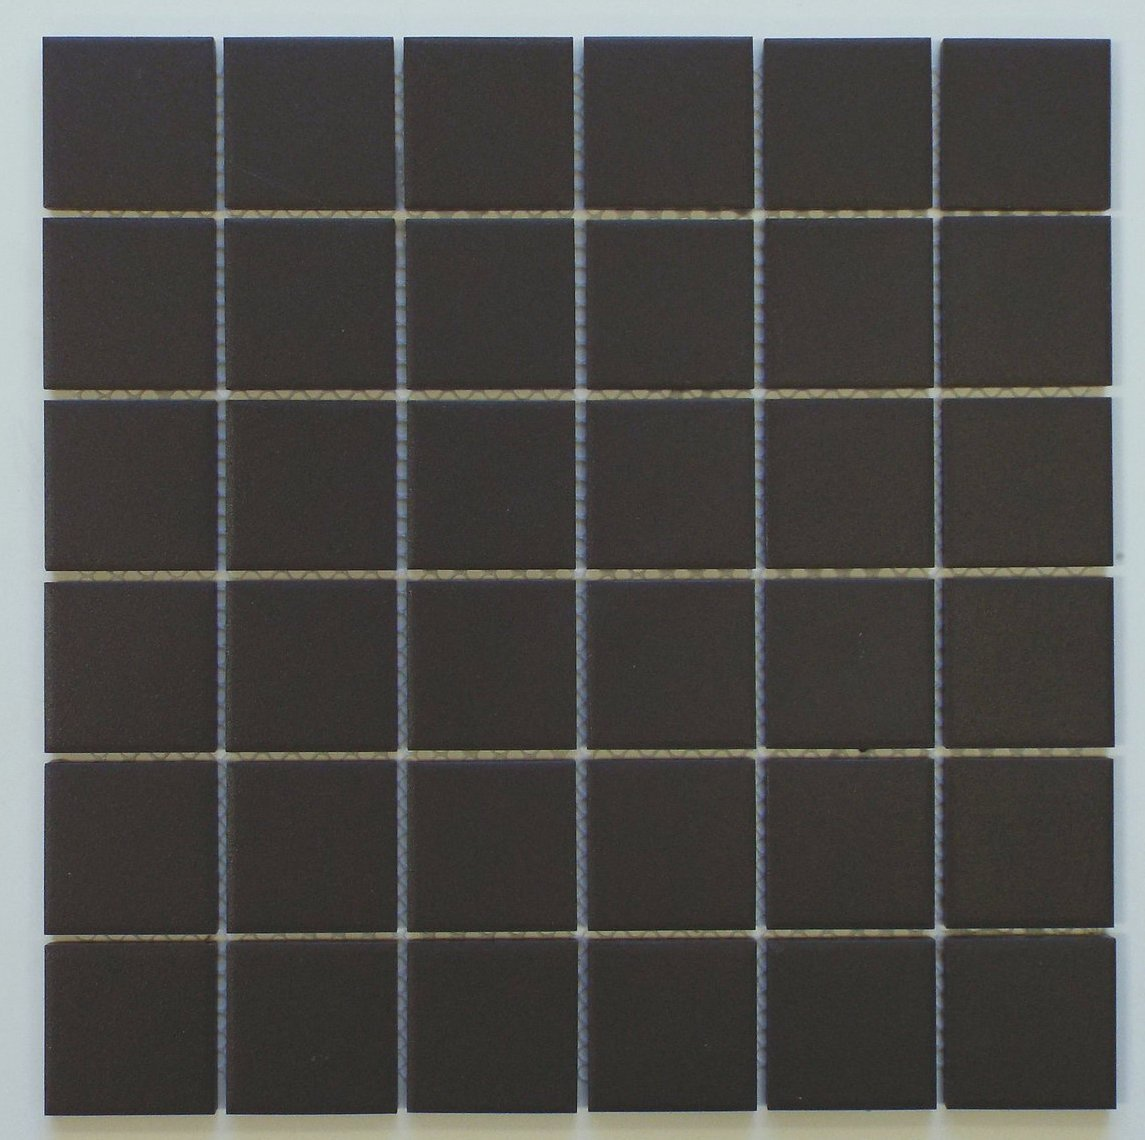 Vintage Black Unglazed Square 2x2 Inch Porcelain Floor & Wall Tile (10 Pcs/10 Sq. Ft. Per Case, $1 Standard Shipping)